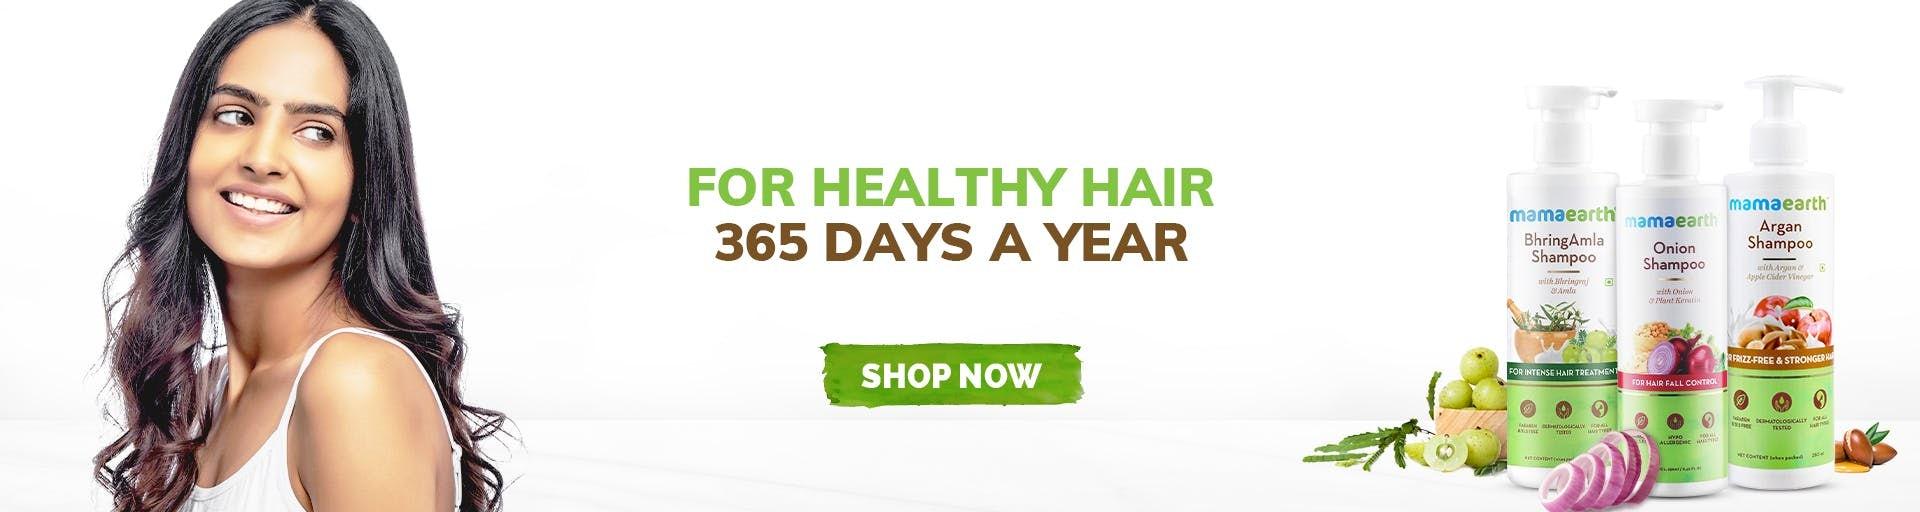 mamaearth.in - Shampoo starting at just ₹349